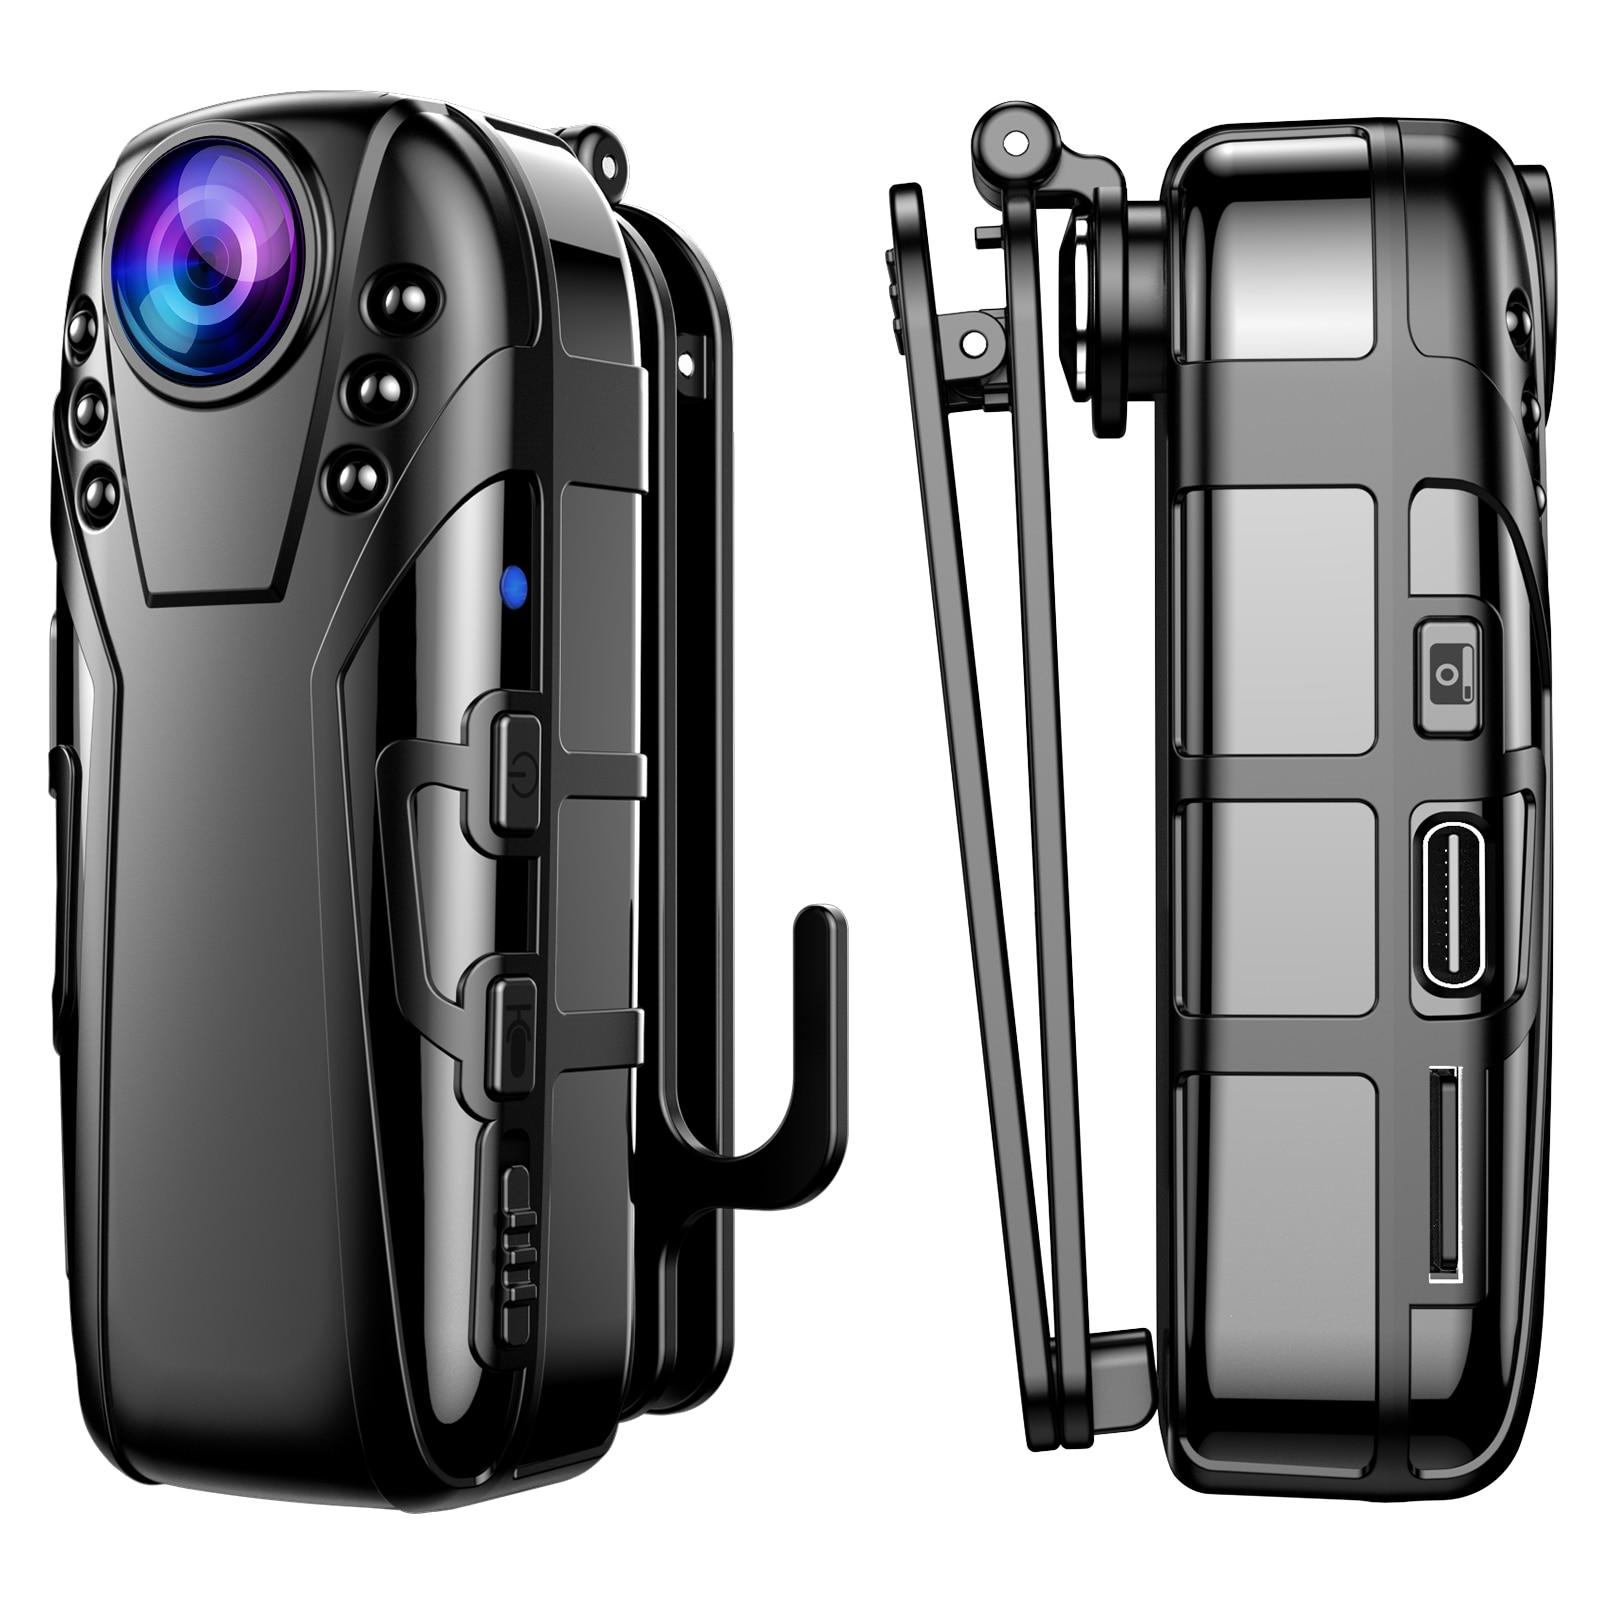 Boblov L02 كاميرا صغيرة كامل HD 1080P المحمولة كامارا الشرطة مسجل دي في أر الجسم كام دراجة نارية الحركة الهيكل كاميرا صغيرة